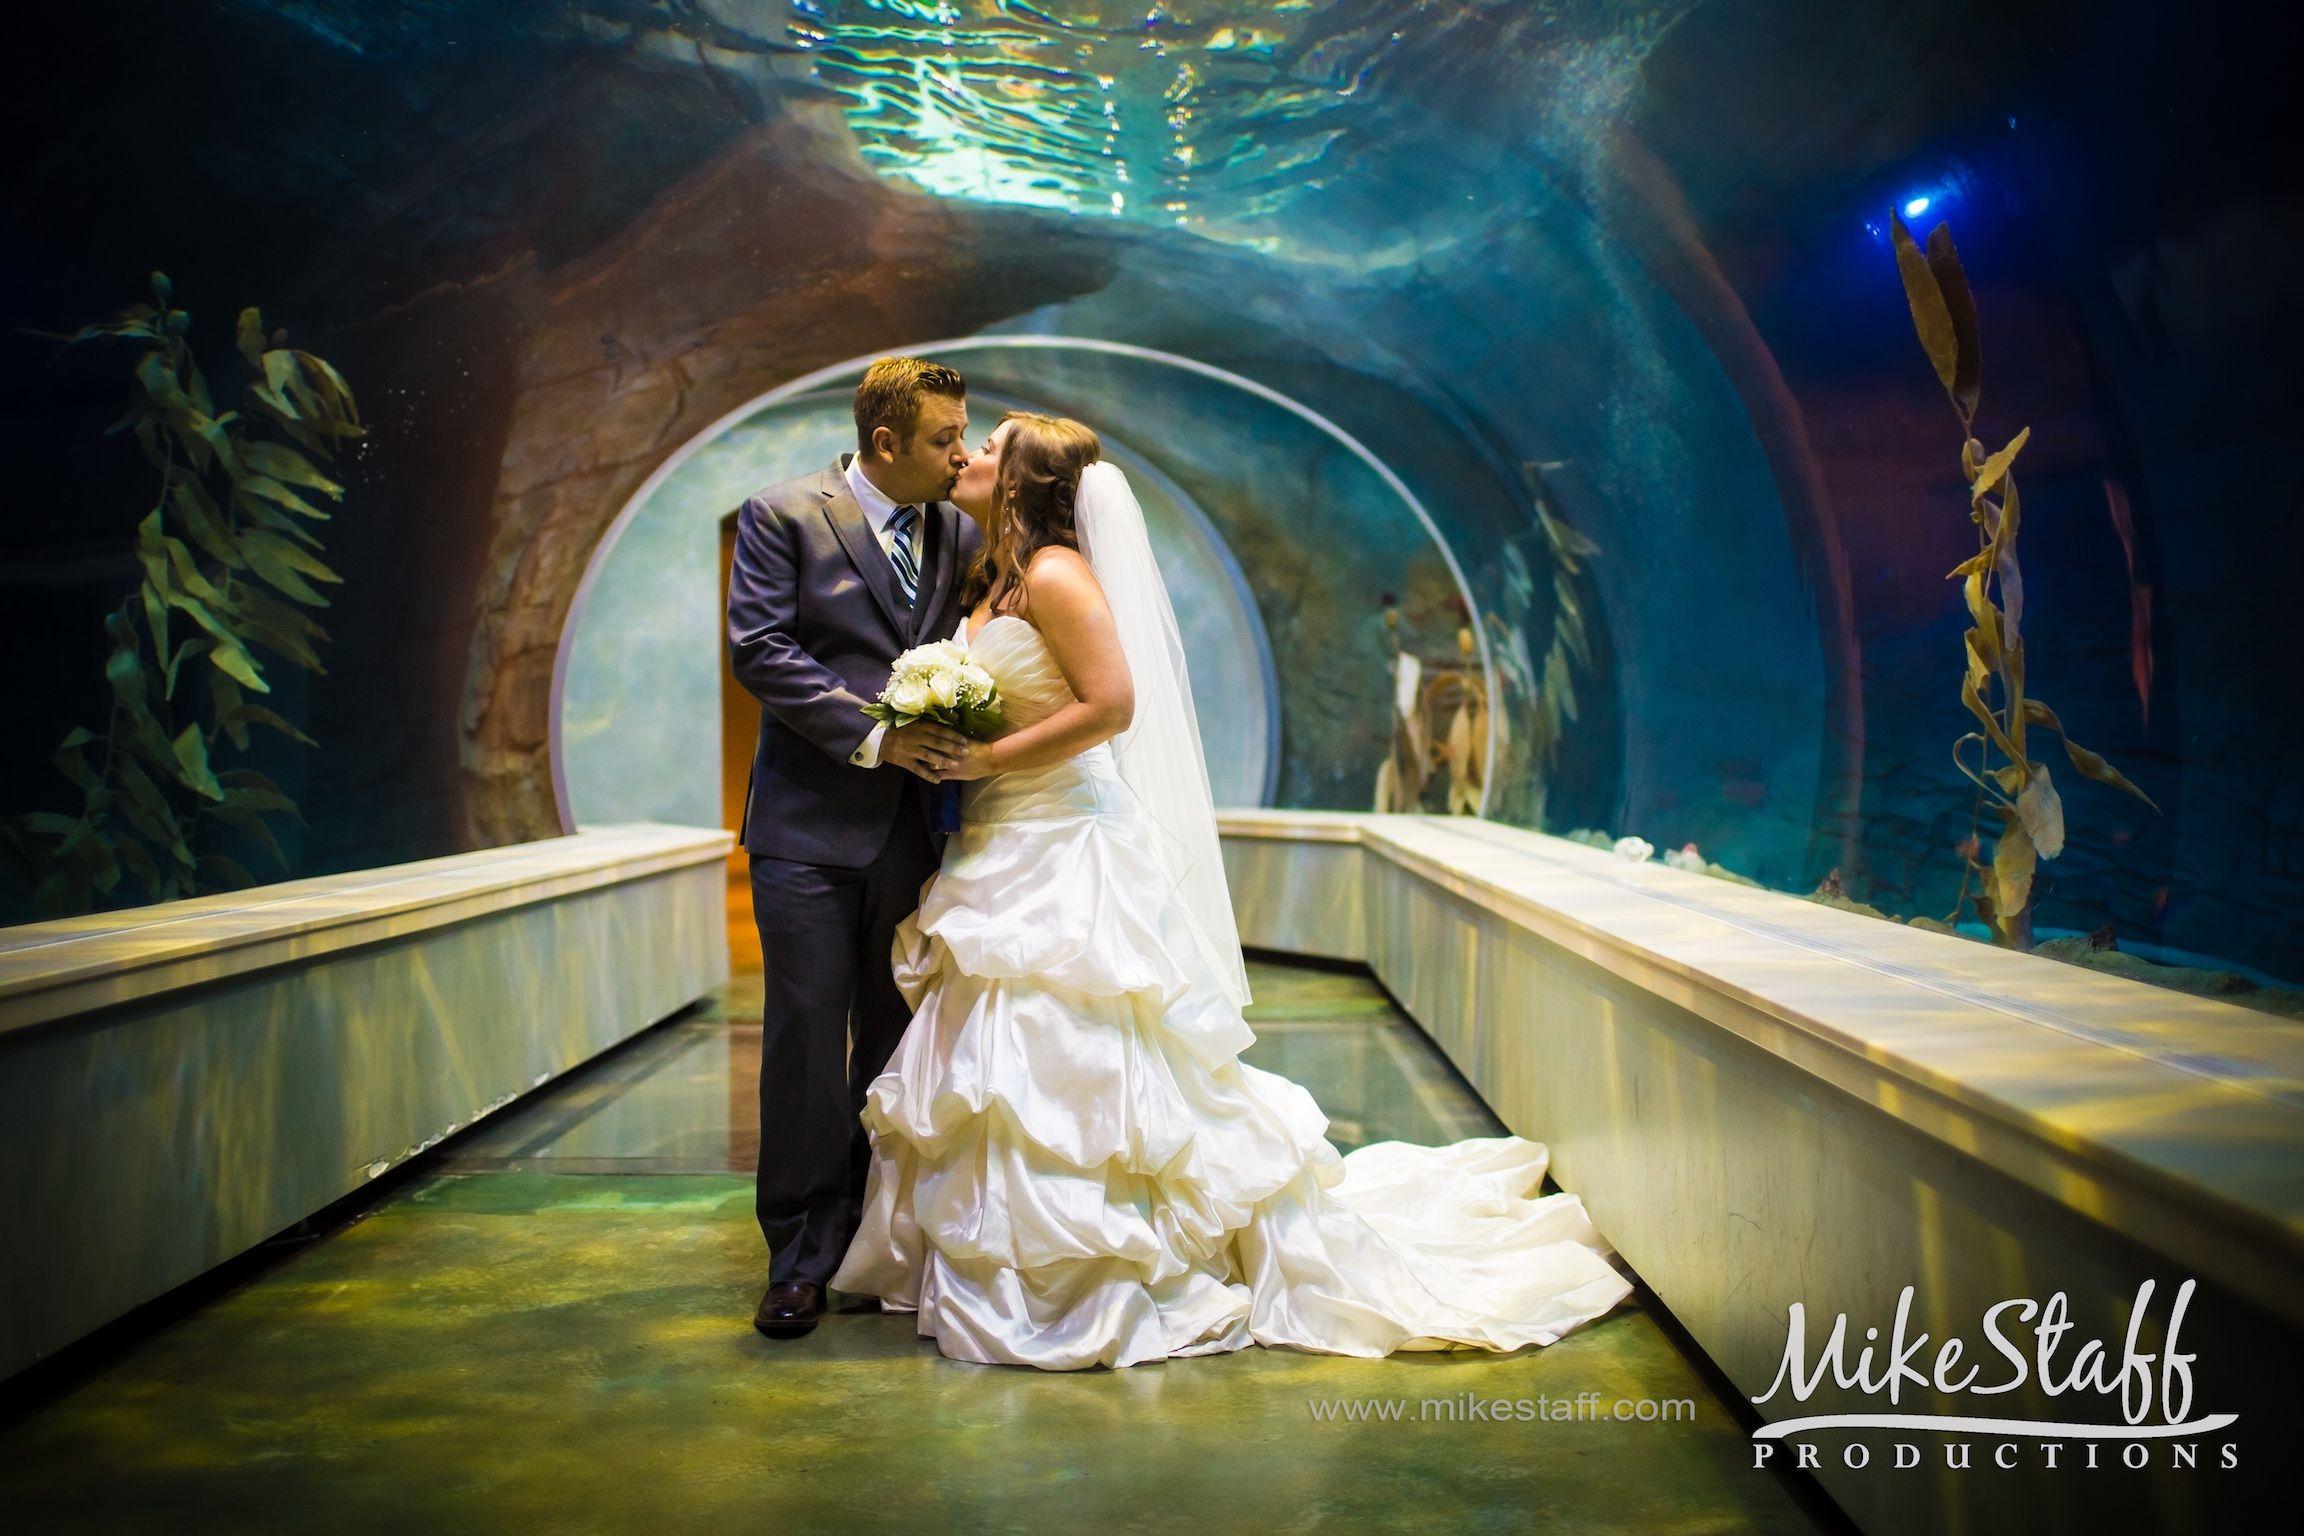 Bride And Groom Kissing In Aquarium Tunnel Michiganwedding Chicagowedding Mikestaffproductions Wedding Wedding Videography Michigan Wedding Chicago Wedding